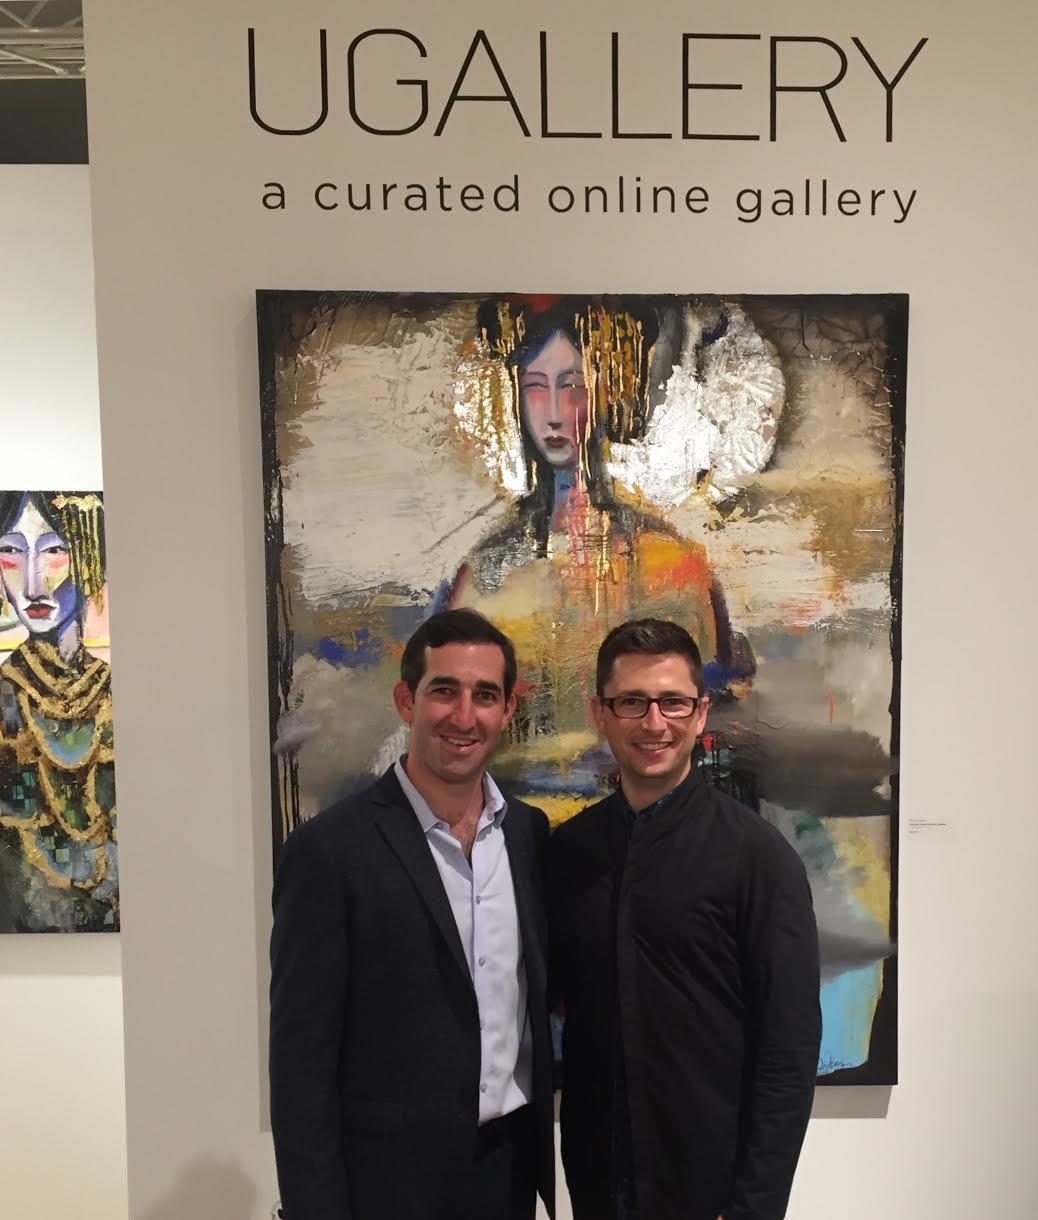 UGallery co-founders Stephen Tanenbaum and Alex Farkas in front of artwork by Scott Dykema